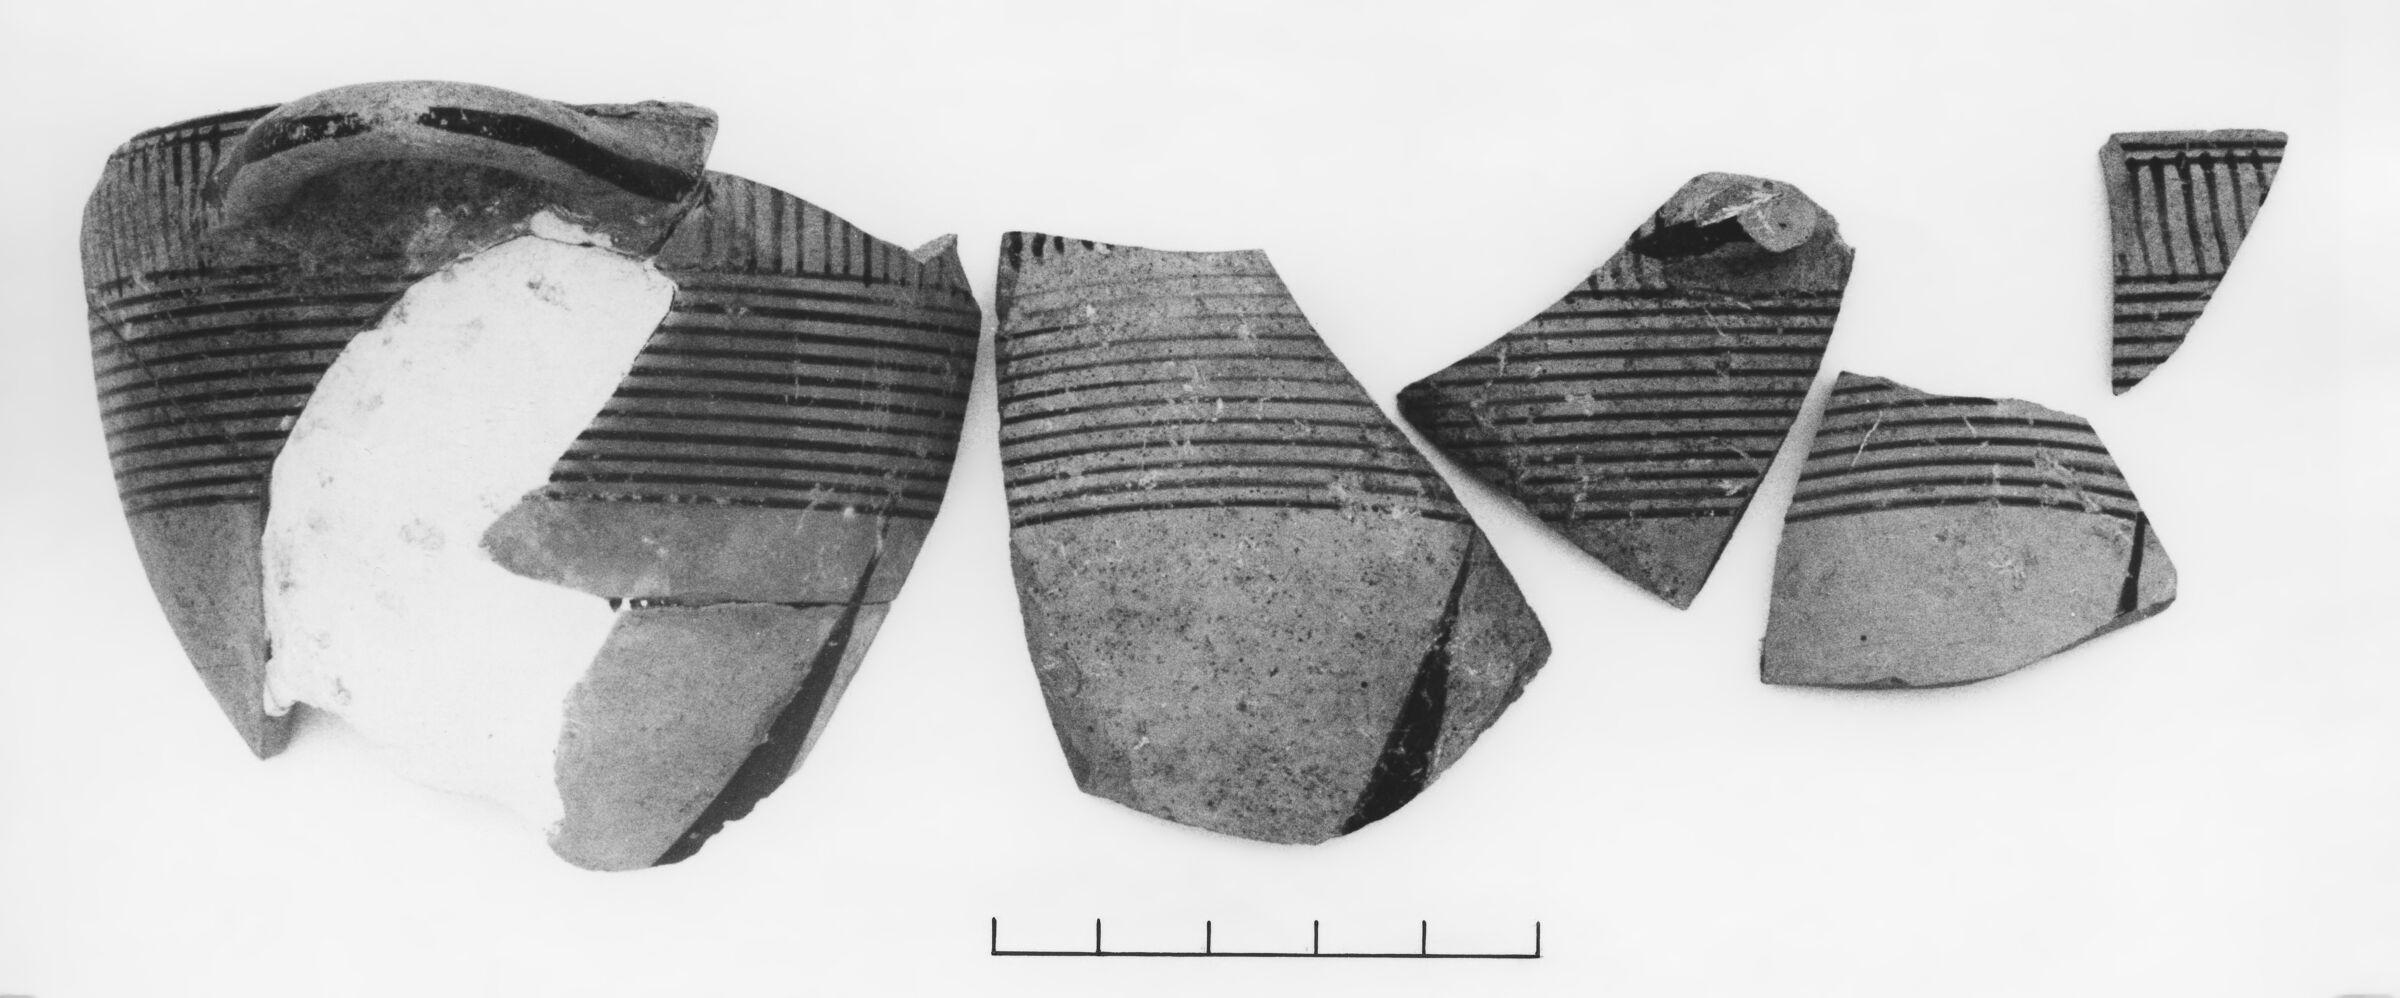 Middle Protocorinthian Linear Kotyle Fragments